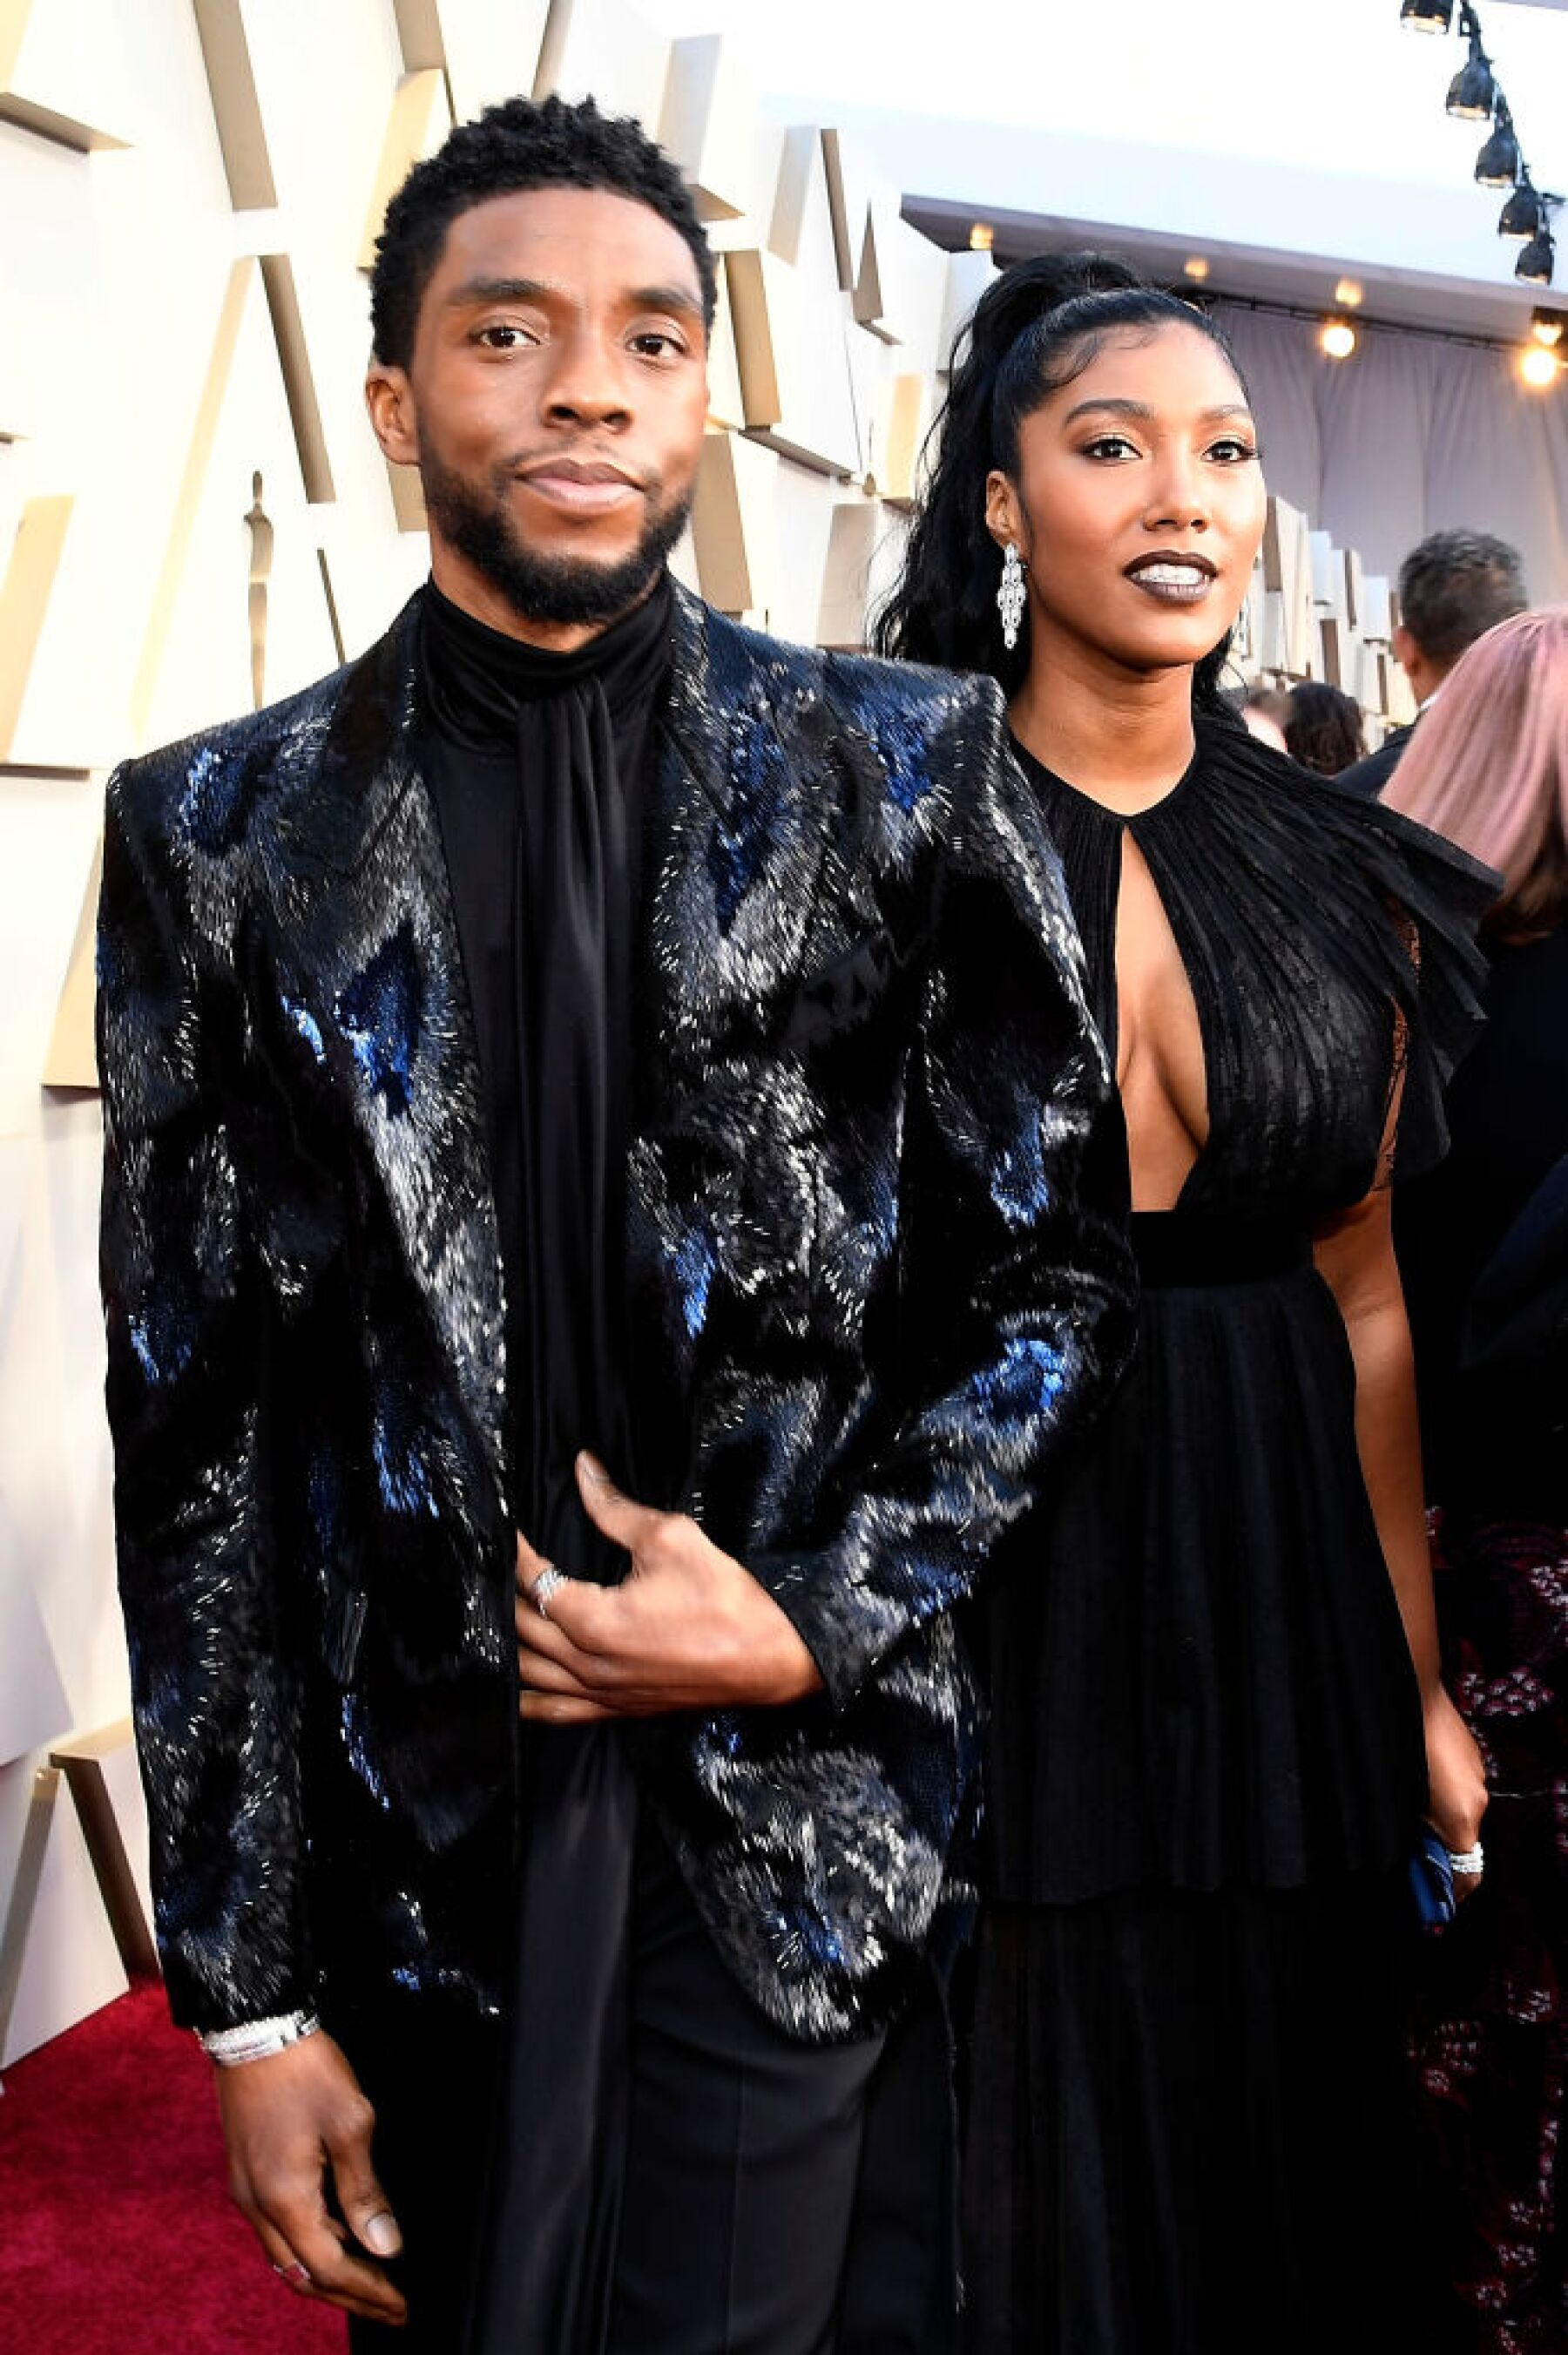 Chadwick Boseman protegió a su esposa pero no dejó testamento